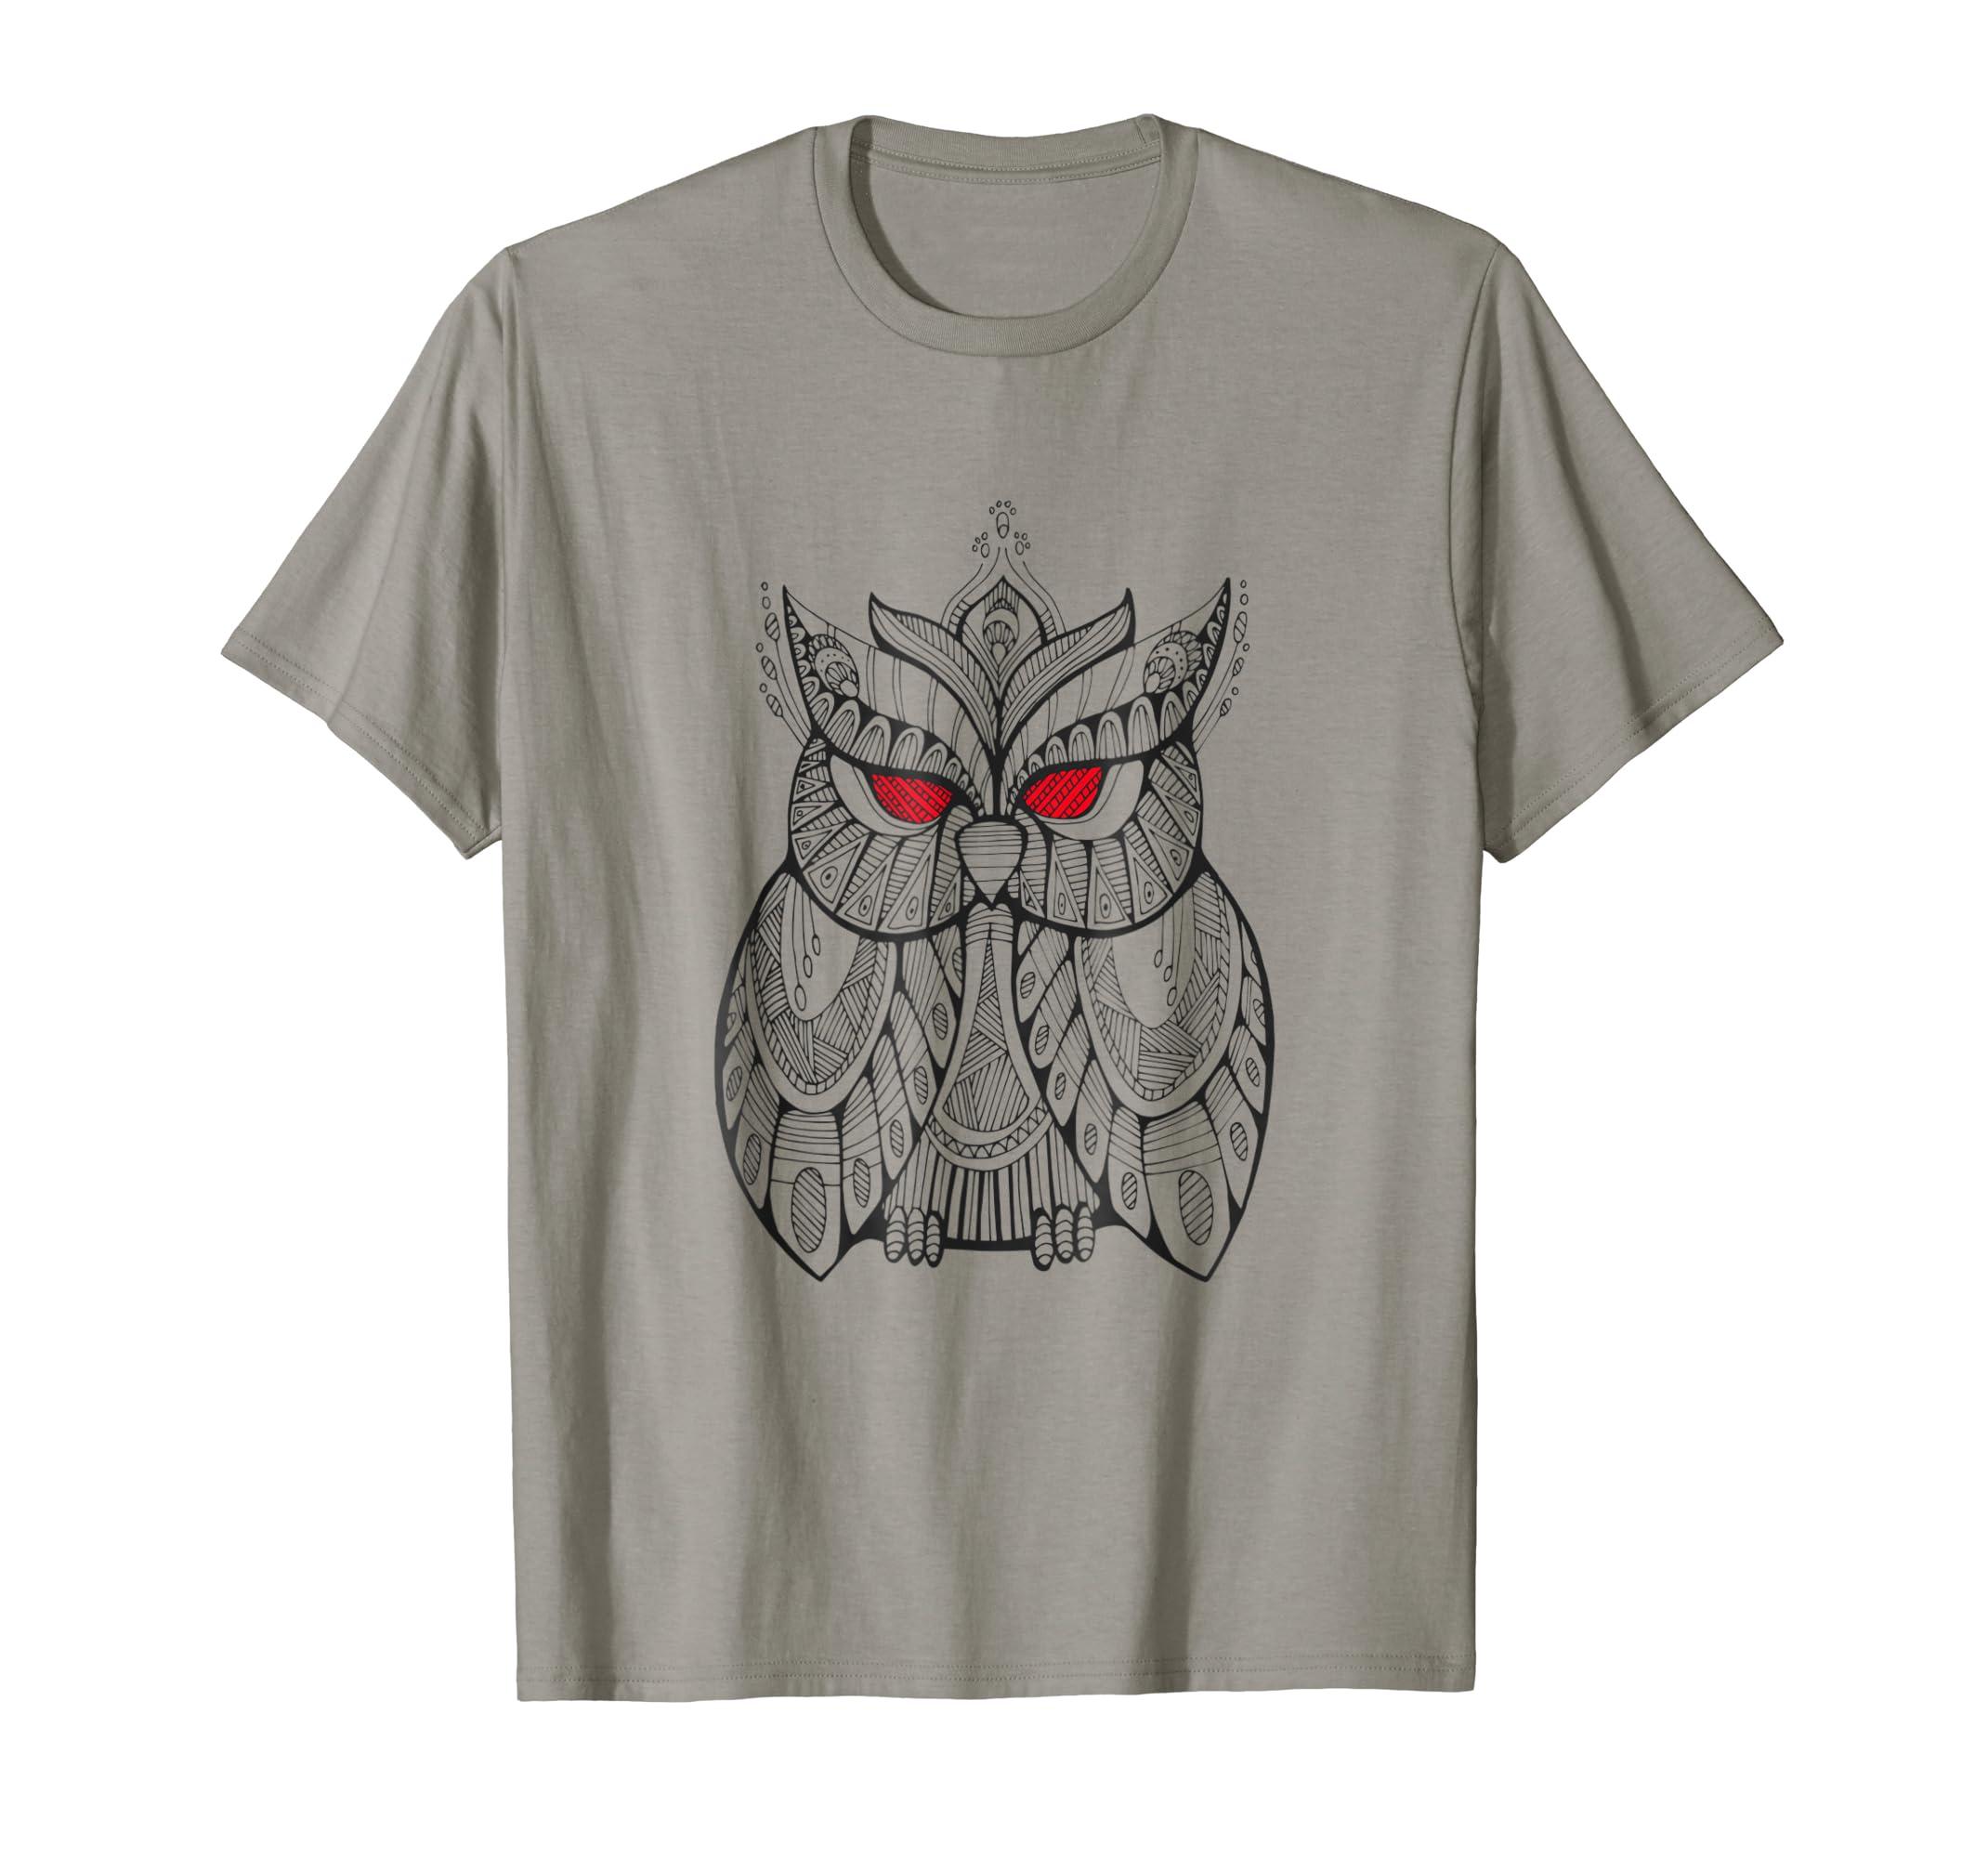 feb7eaef69 Crazy Cool Owl Hand Drawn Shirt Design-AZP - anzpets